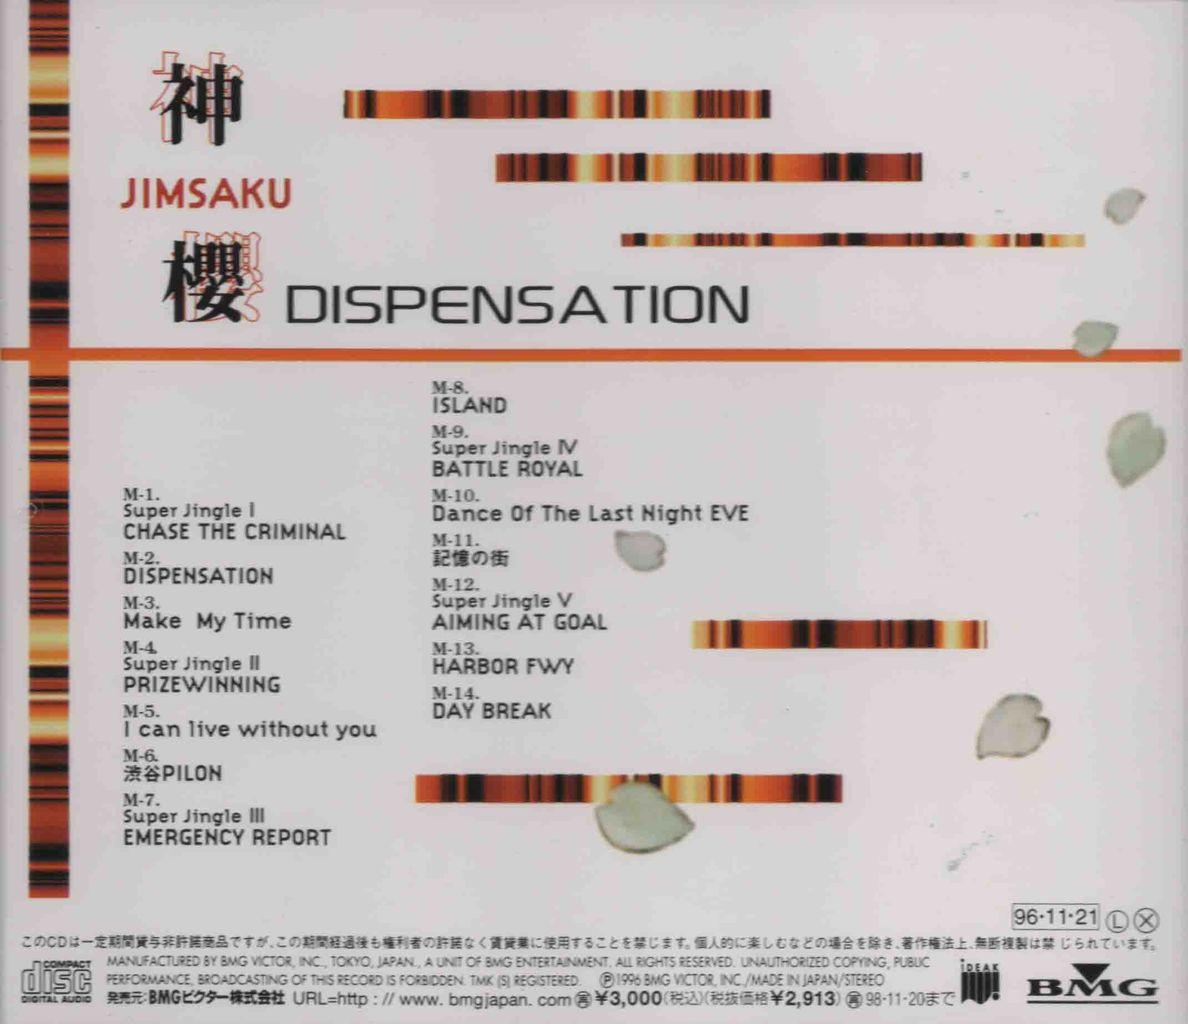 DISPENSATION-2